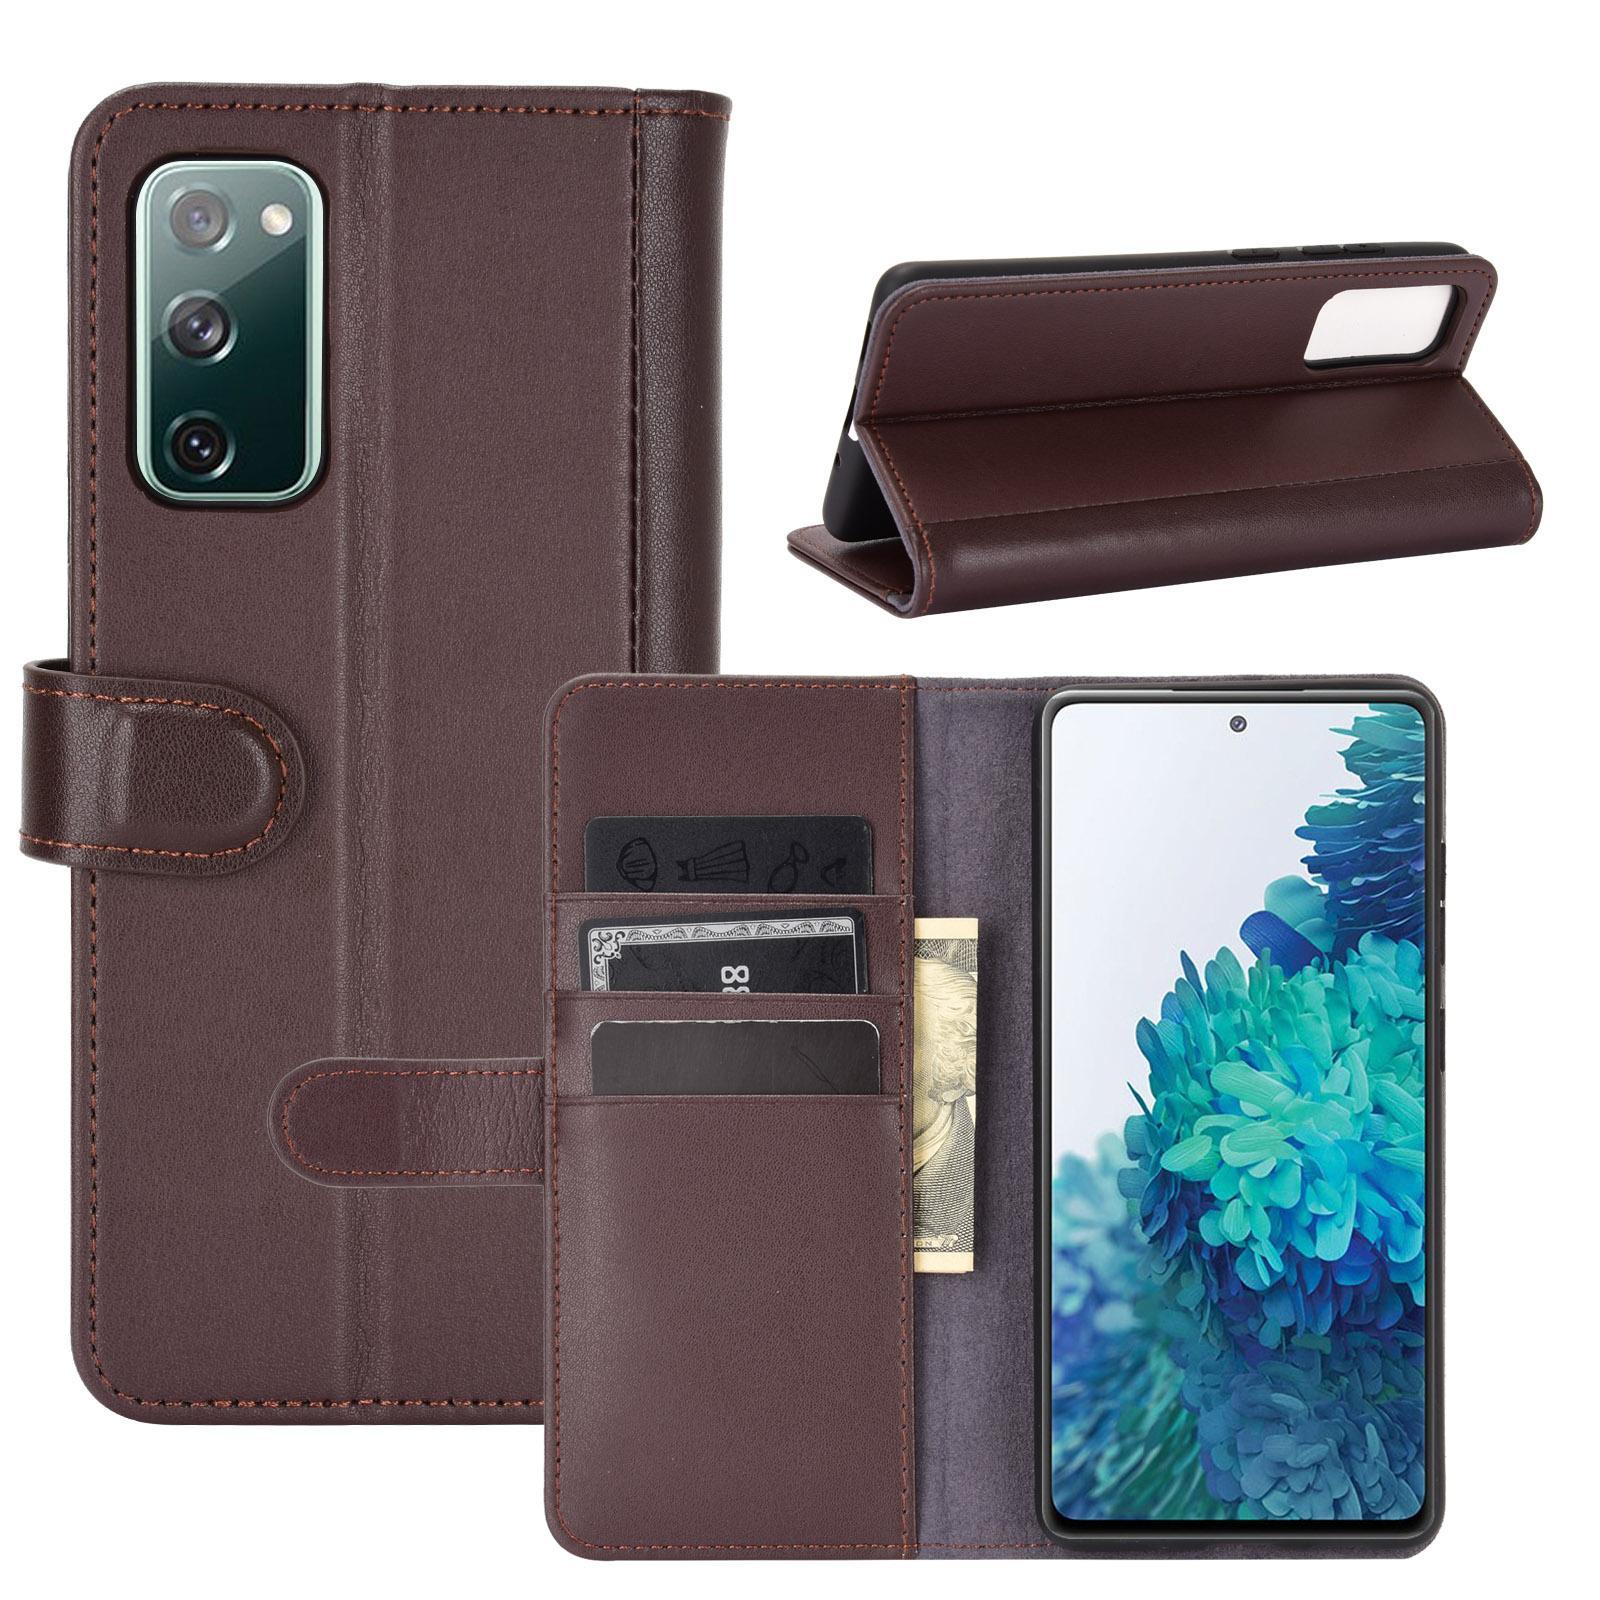 Äkta Läderfodral Samsung Galaxy S20 FE brun